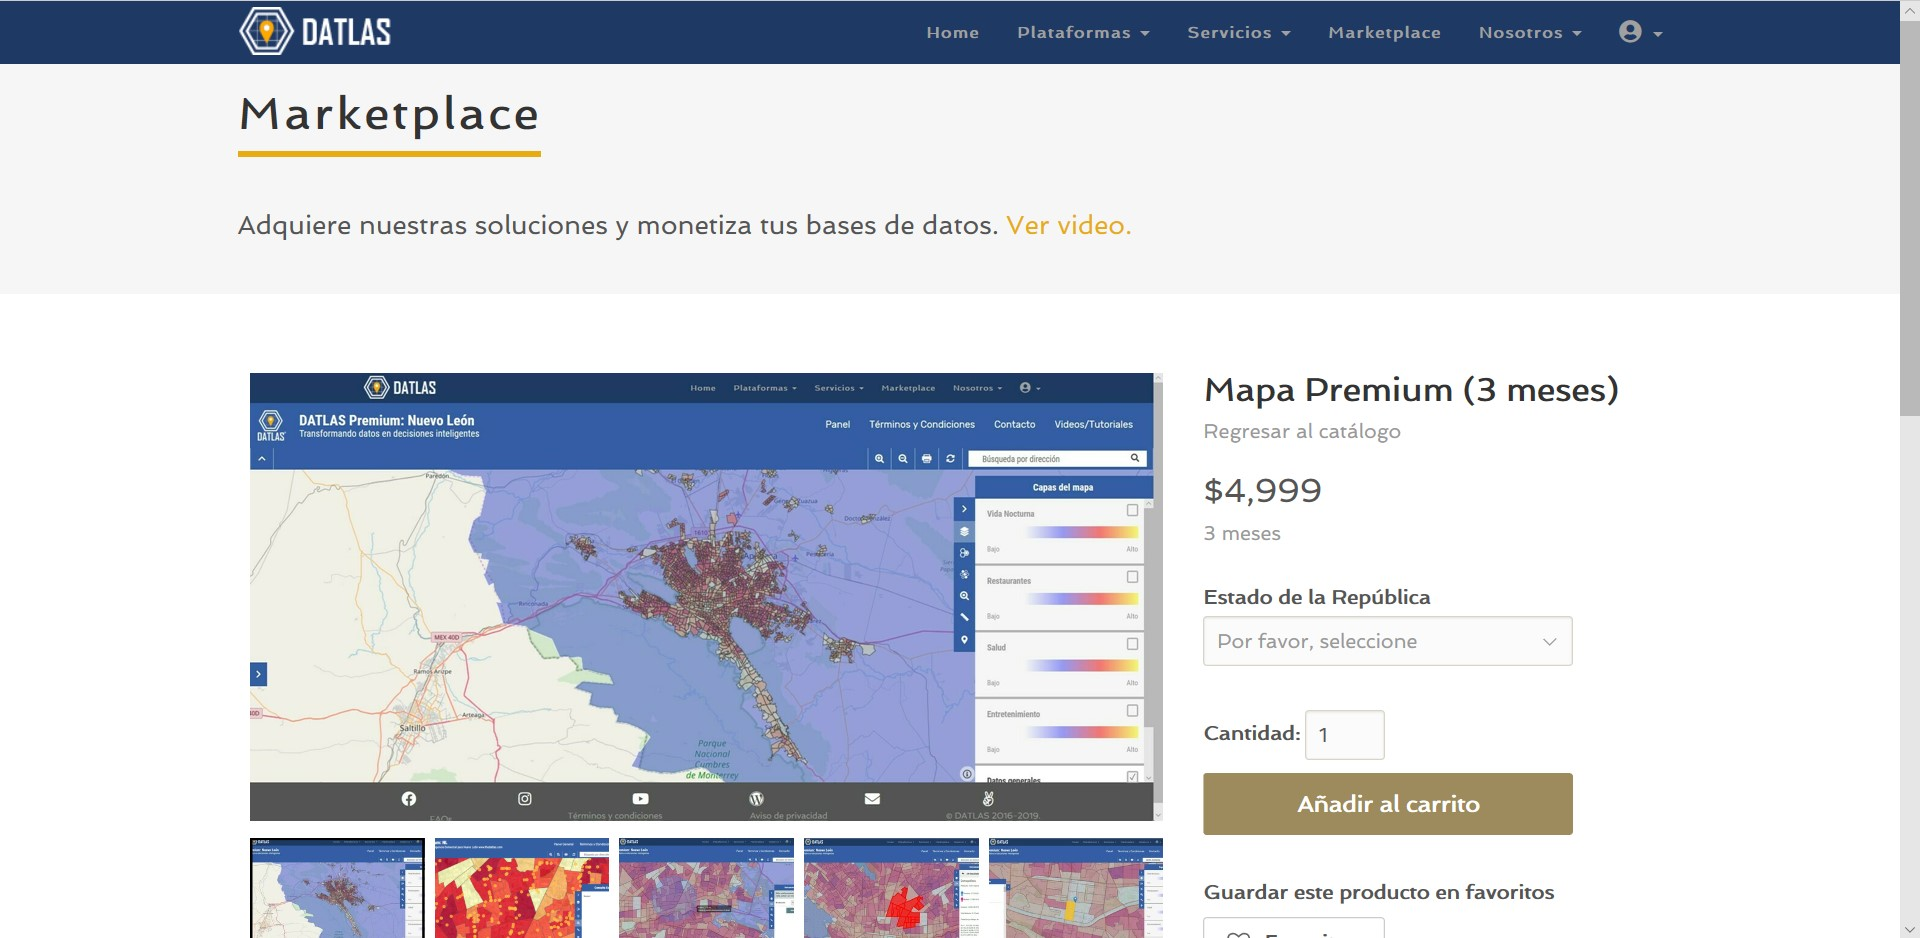 datlas_mx_marketplace_mapa_premium